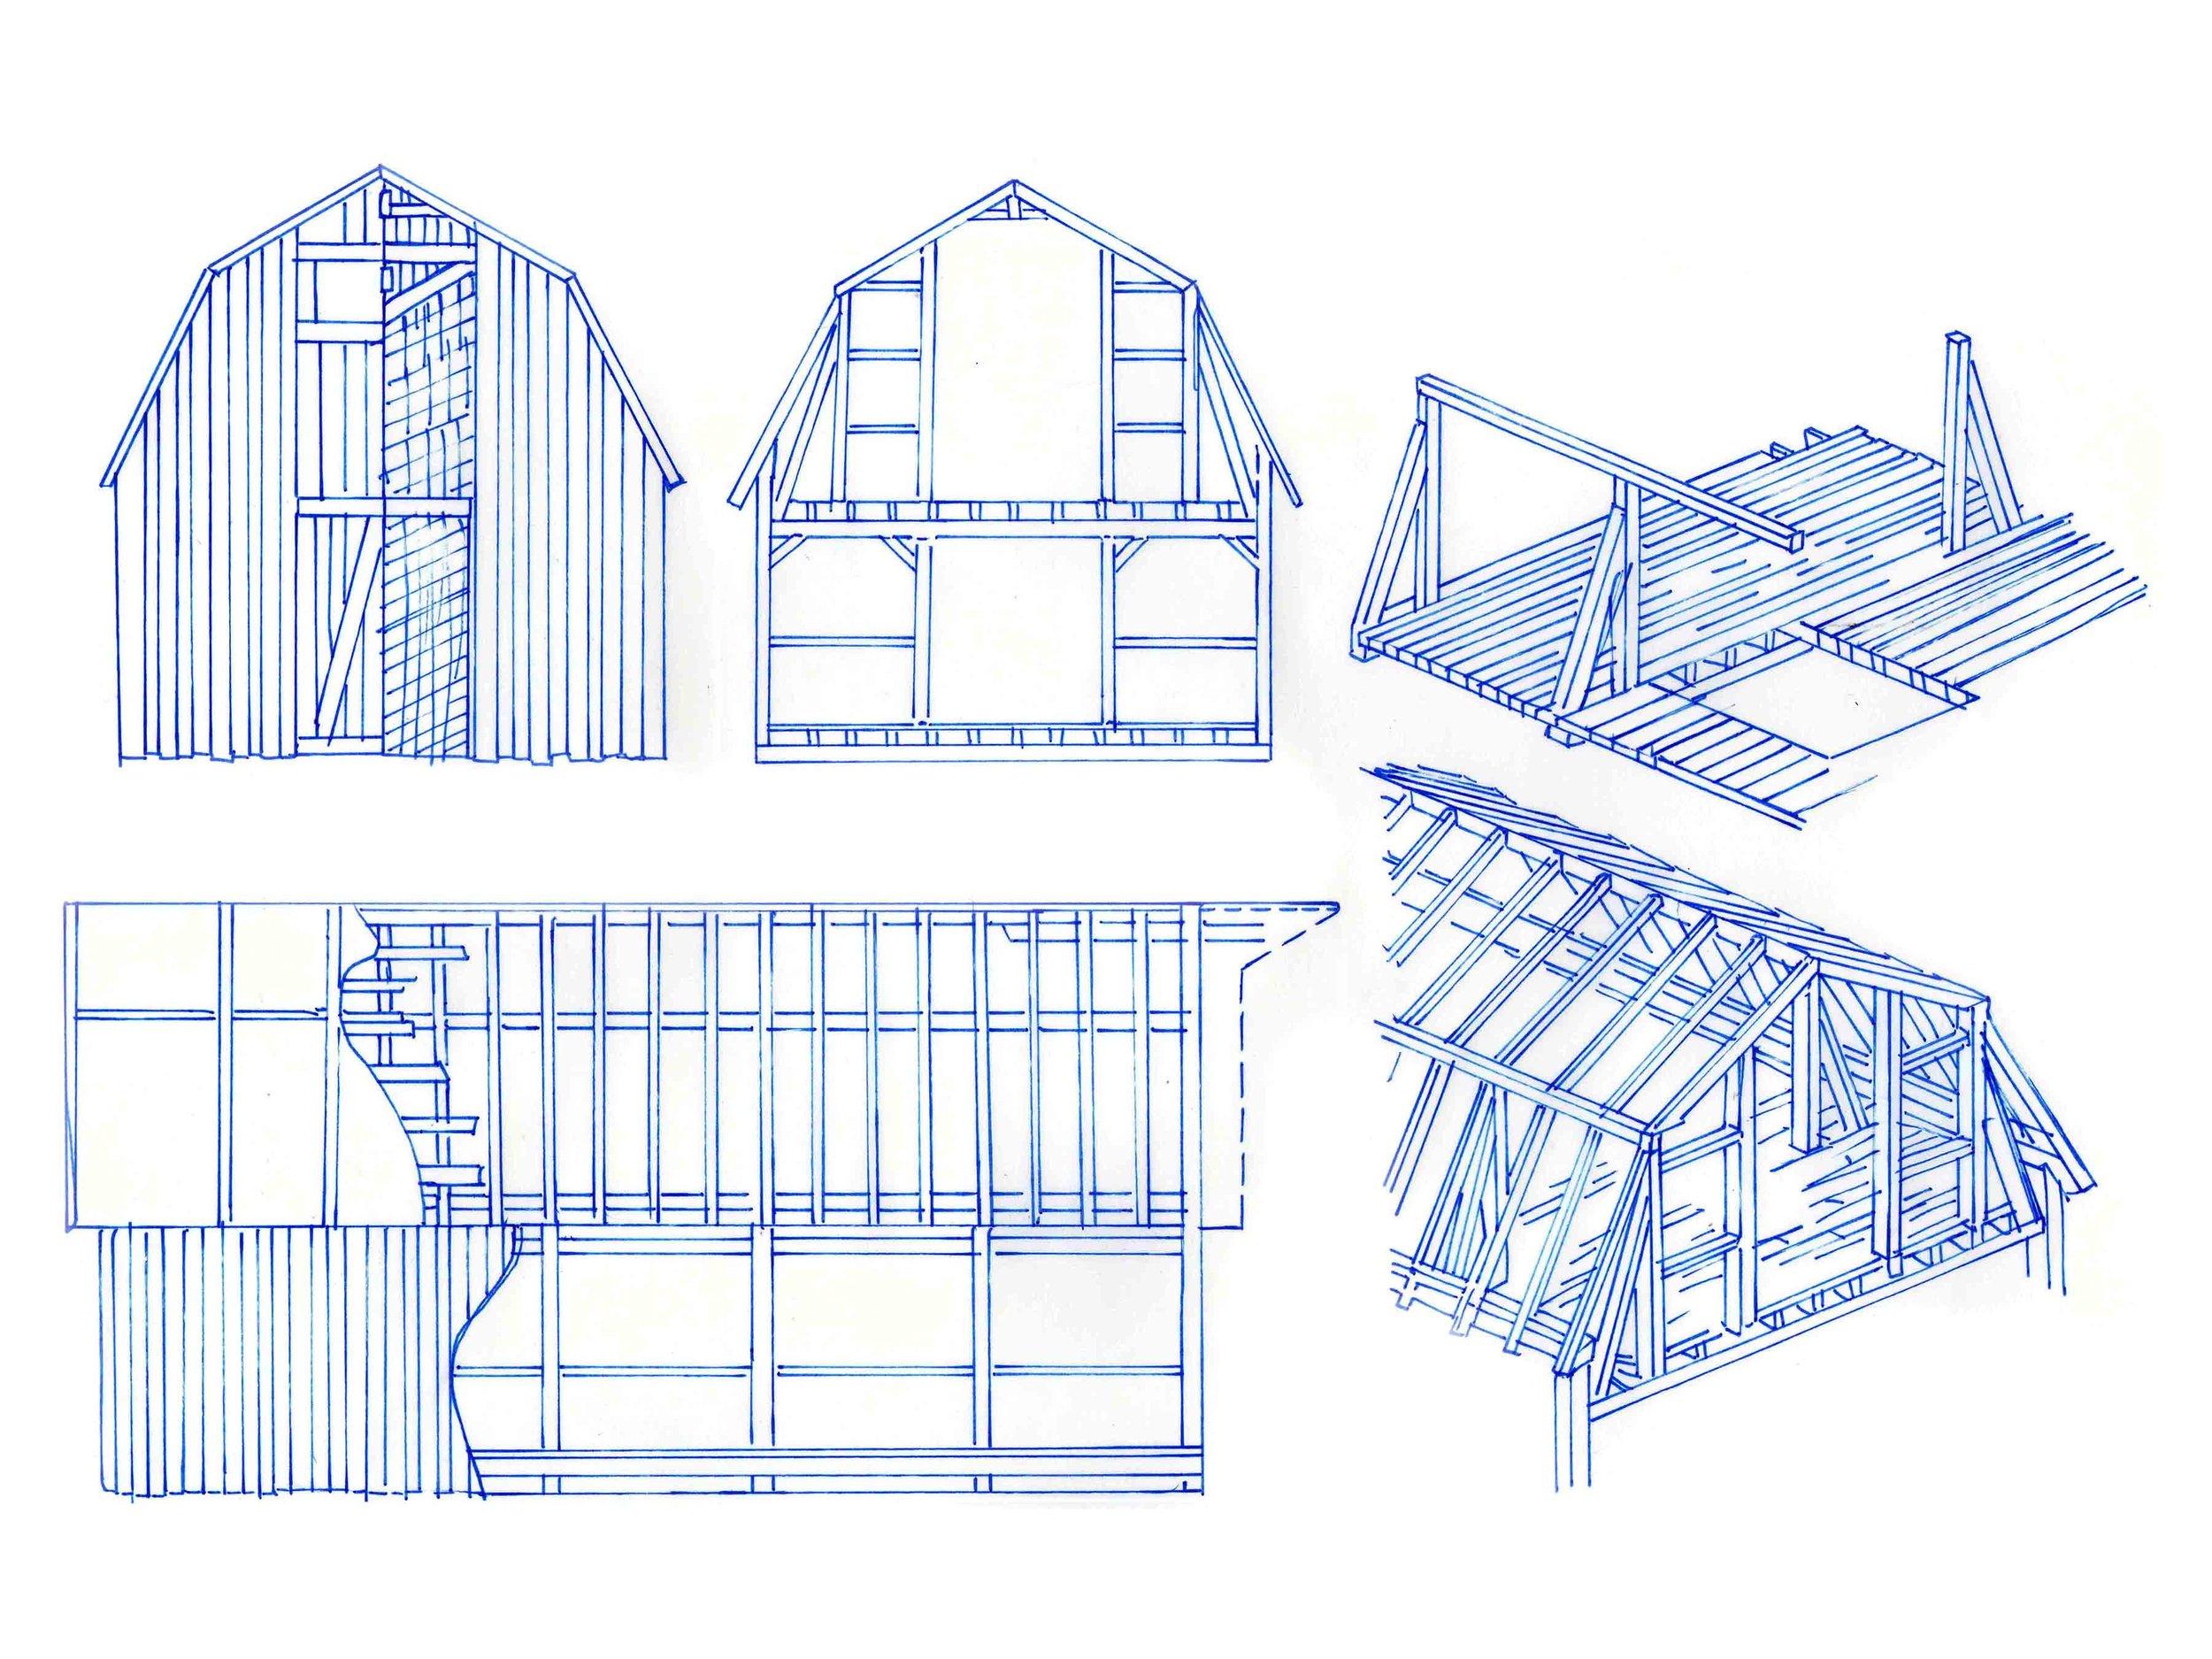 red yarn old barn blueprints fin1 web.jpg